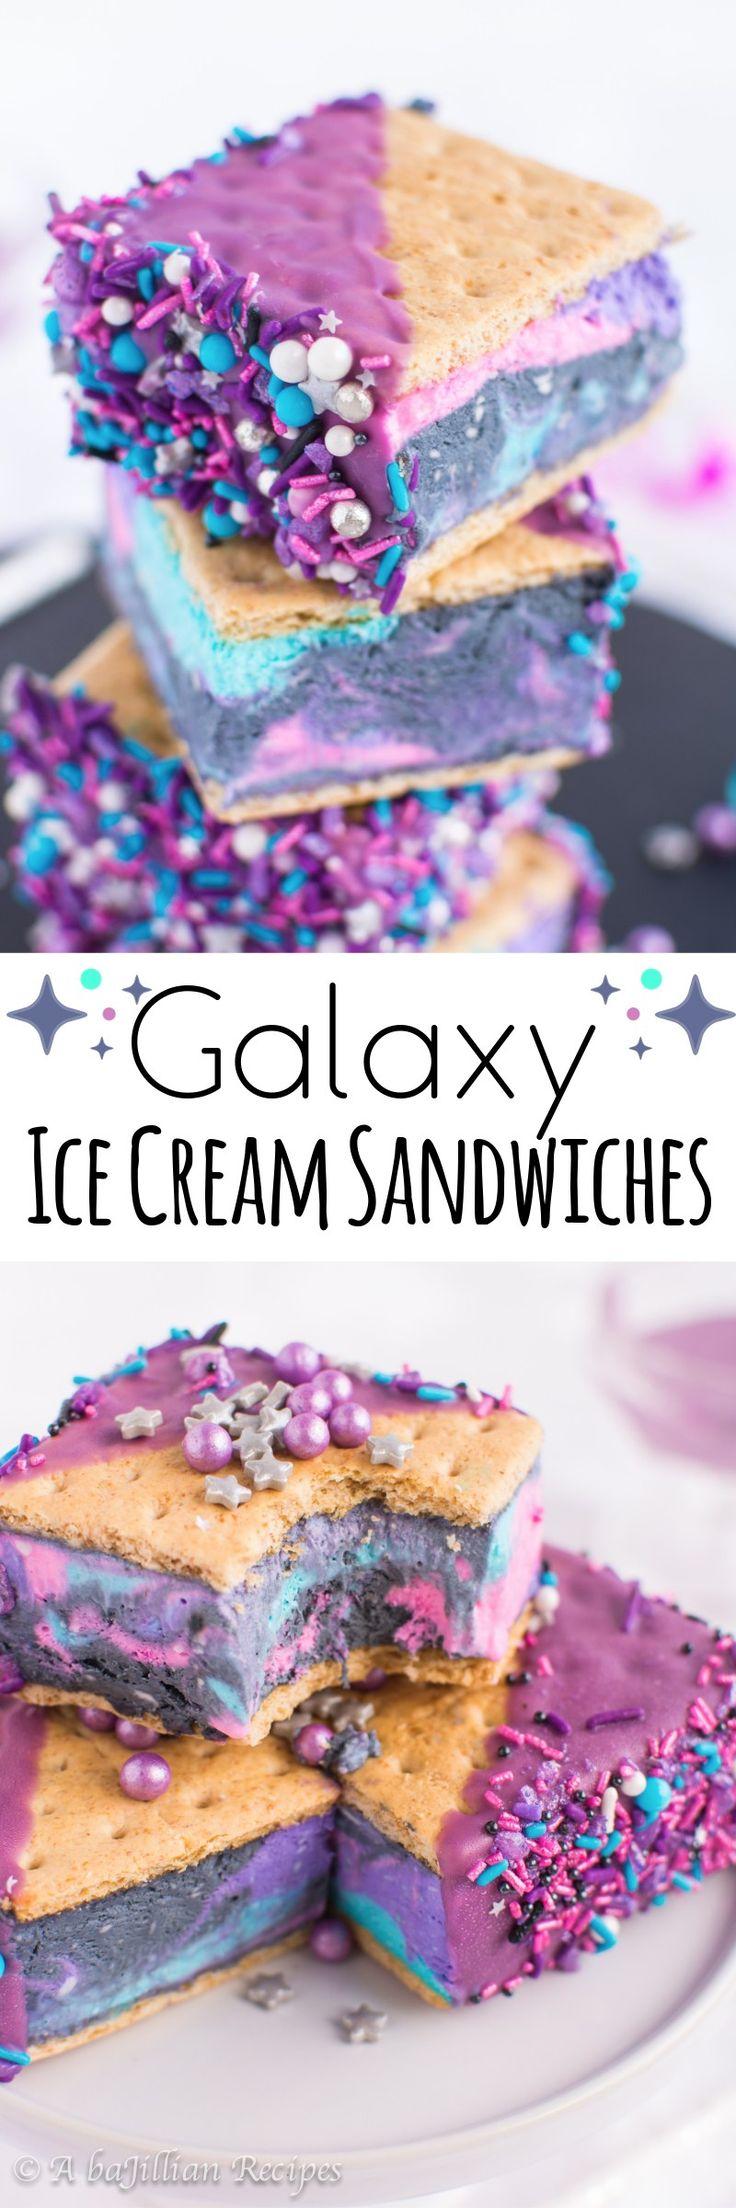 Galaxy Ice Cream Sandwiches